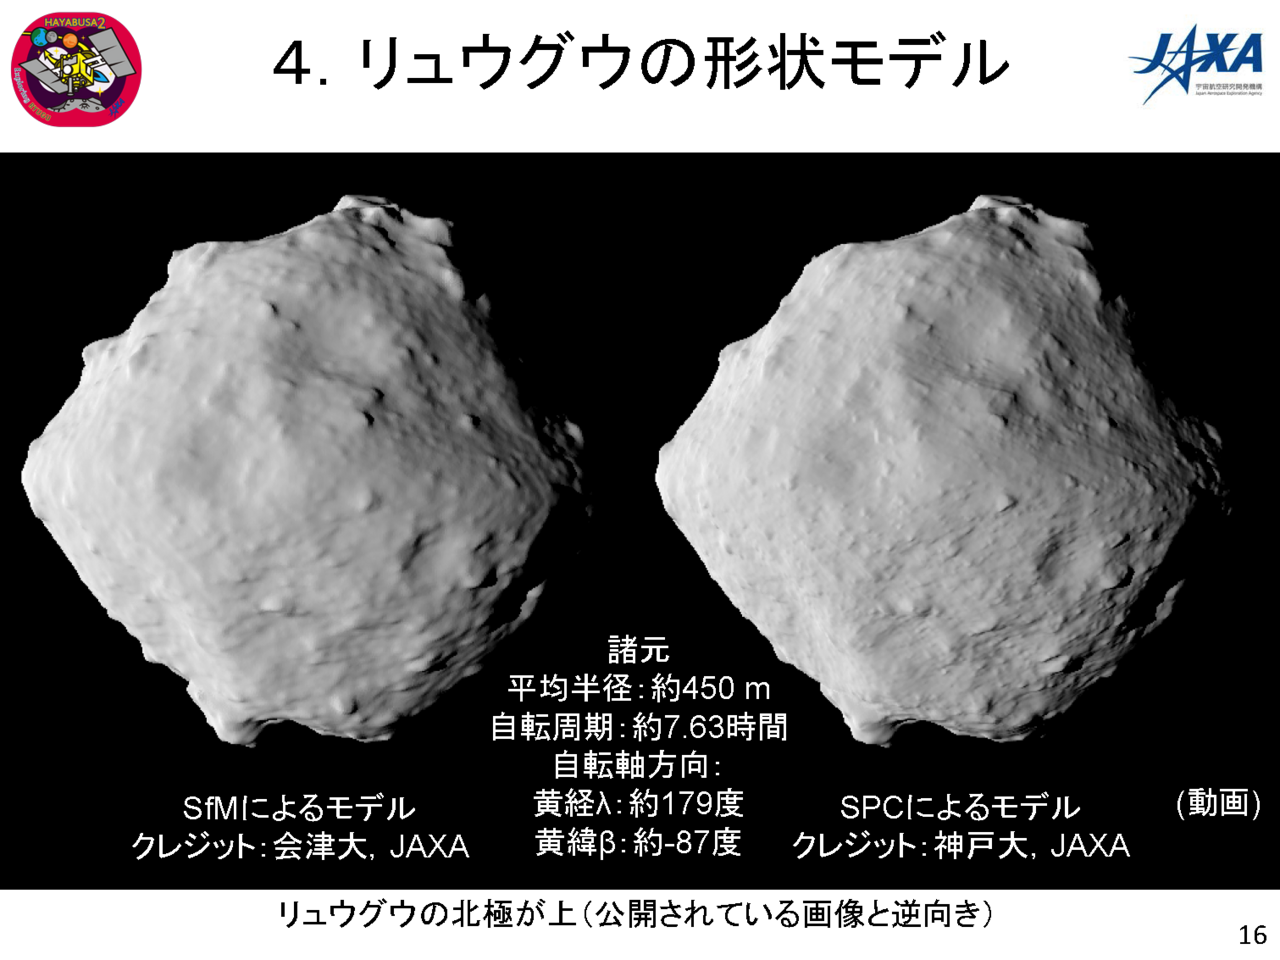 f:id:Imamura:20180802145936p:plain